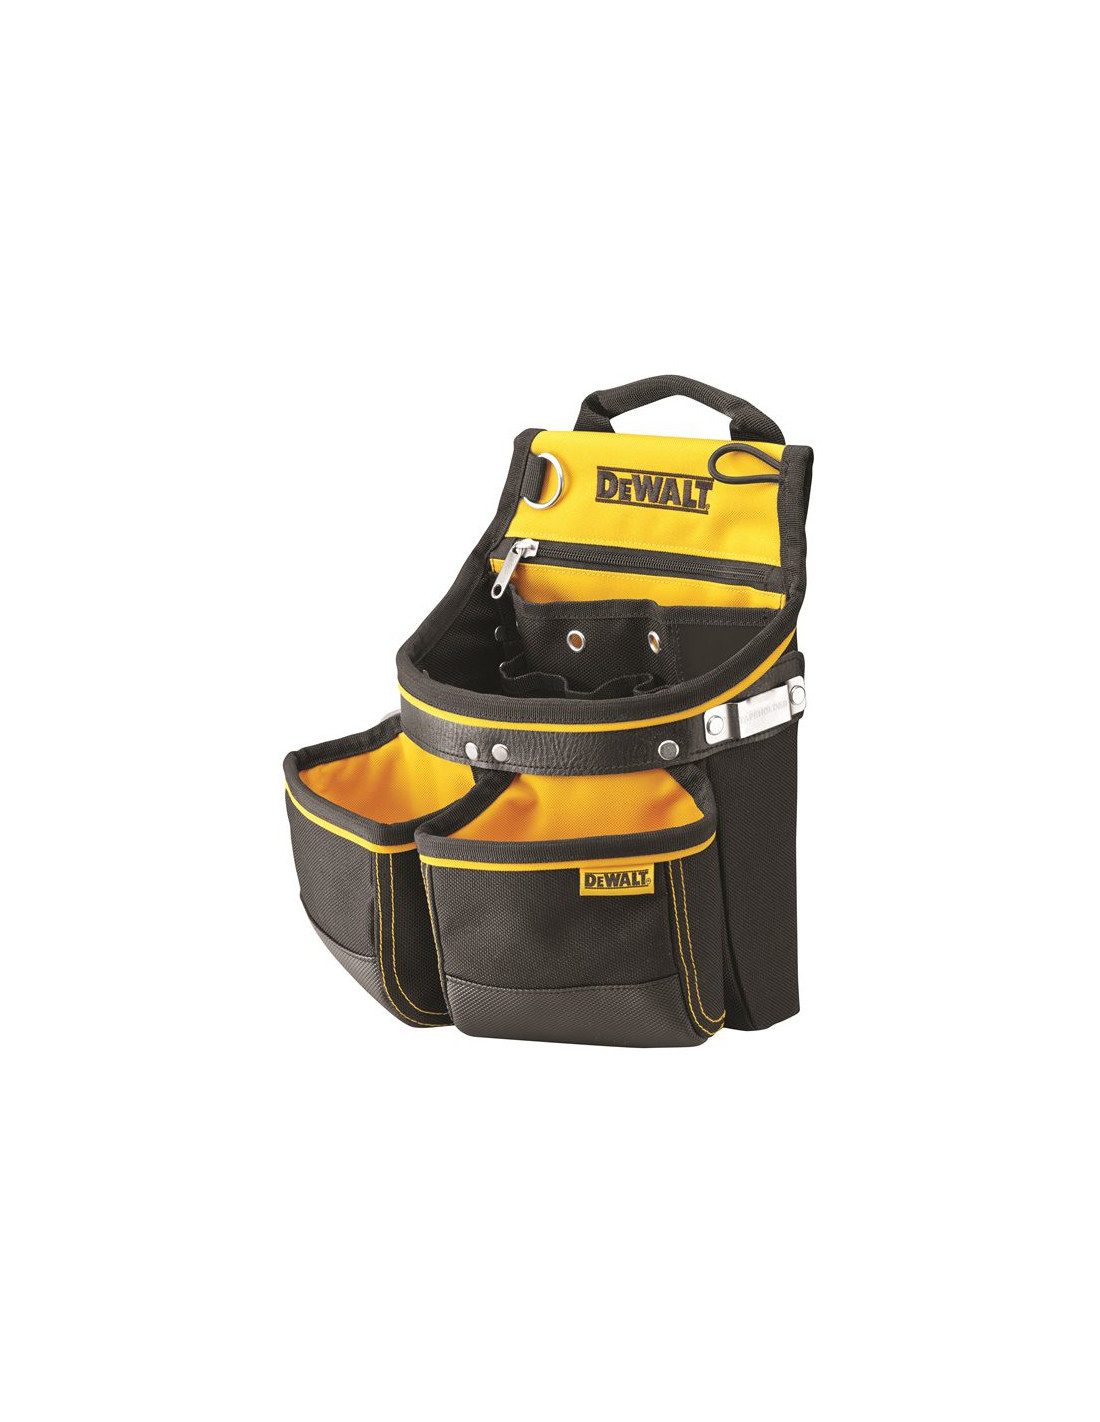 Dewalt DWST1-75650 Bolsa para Clavos